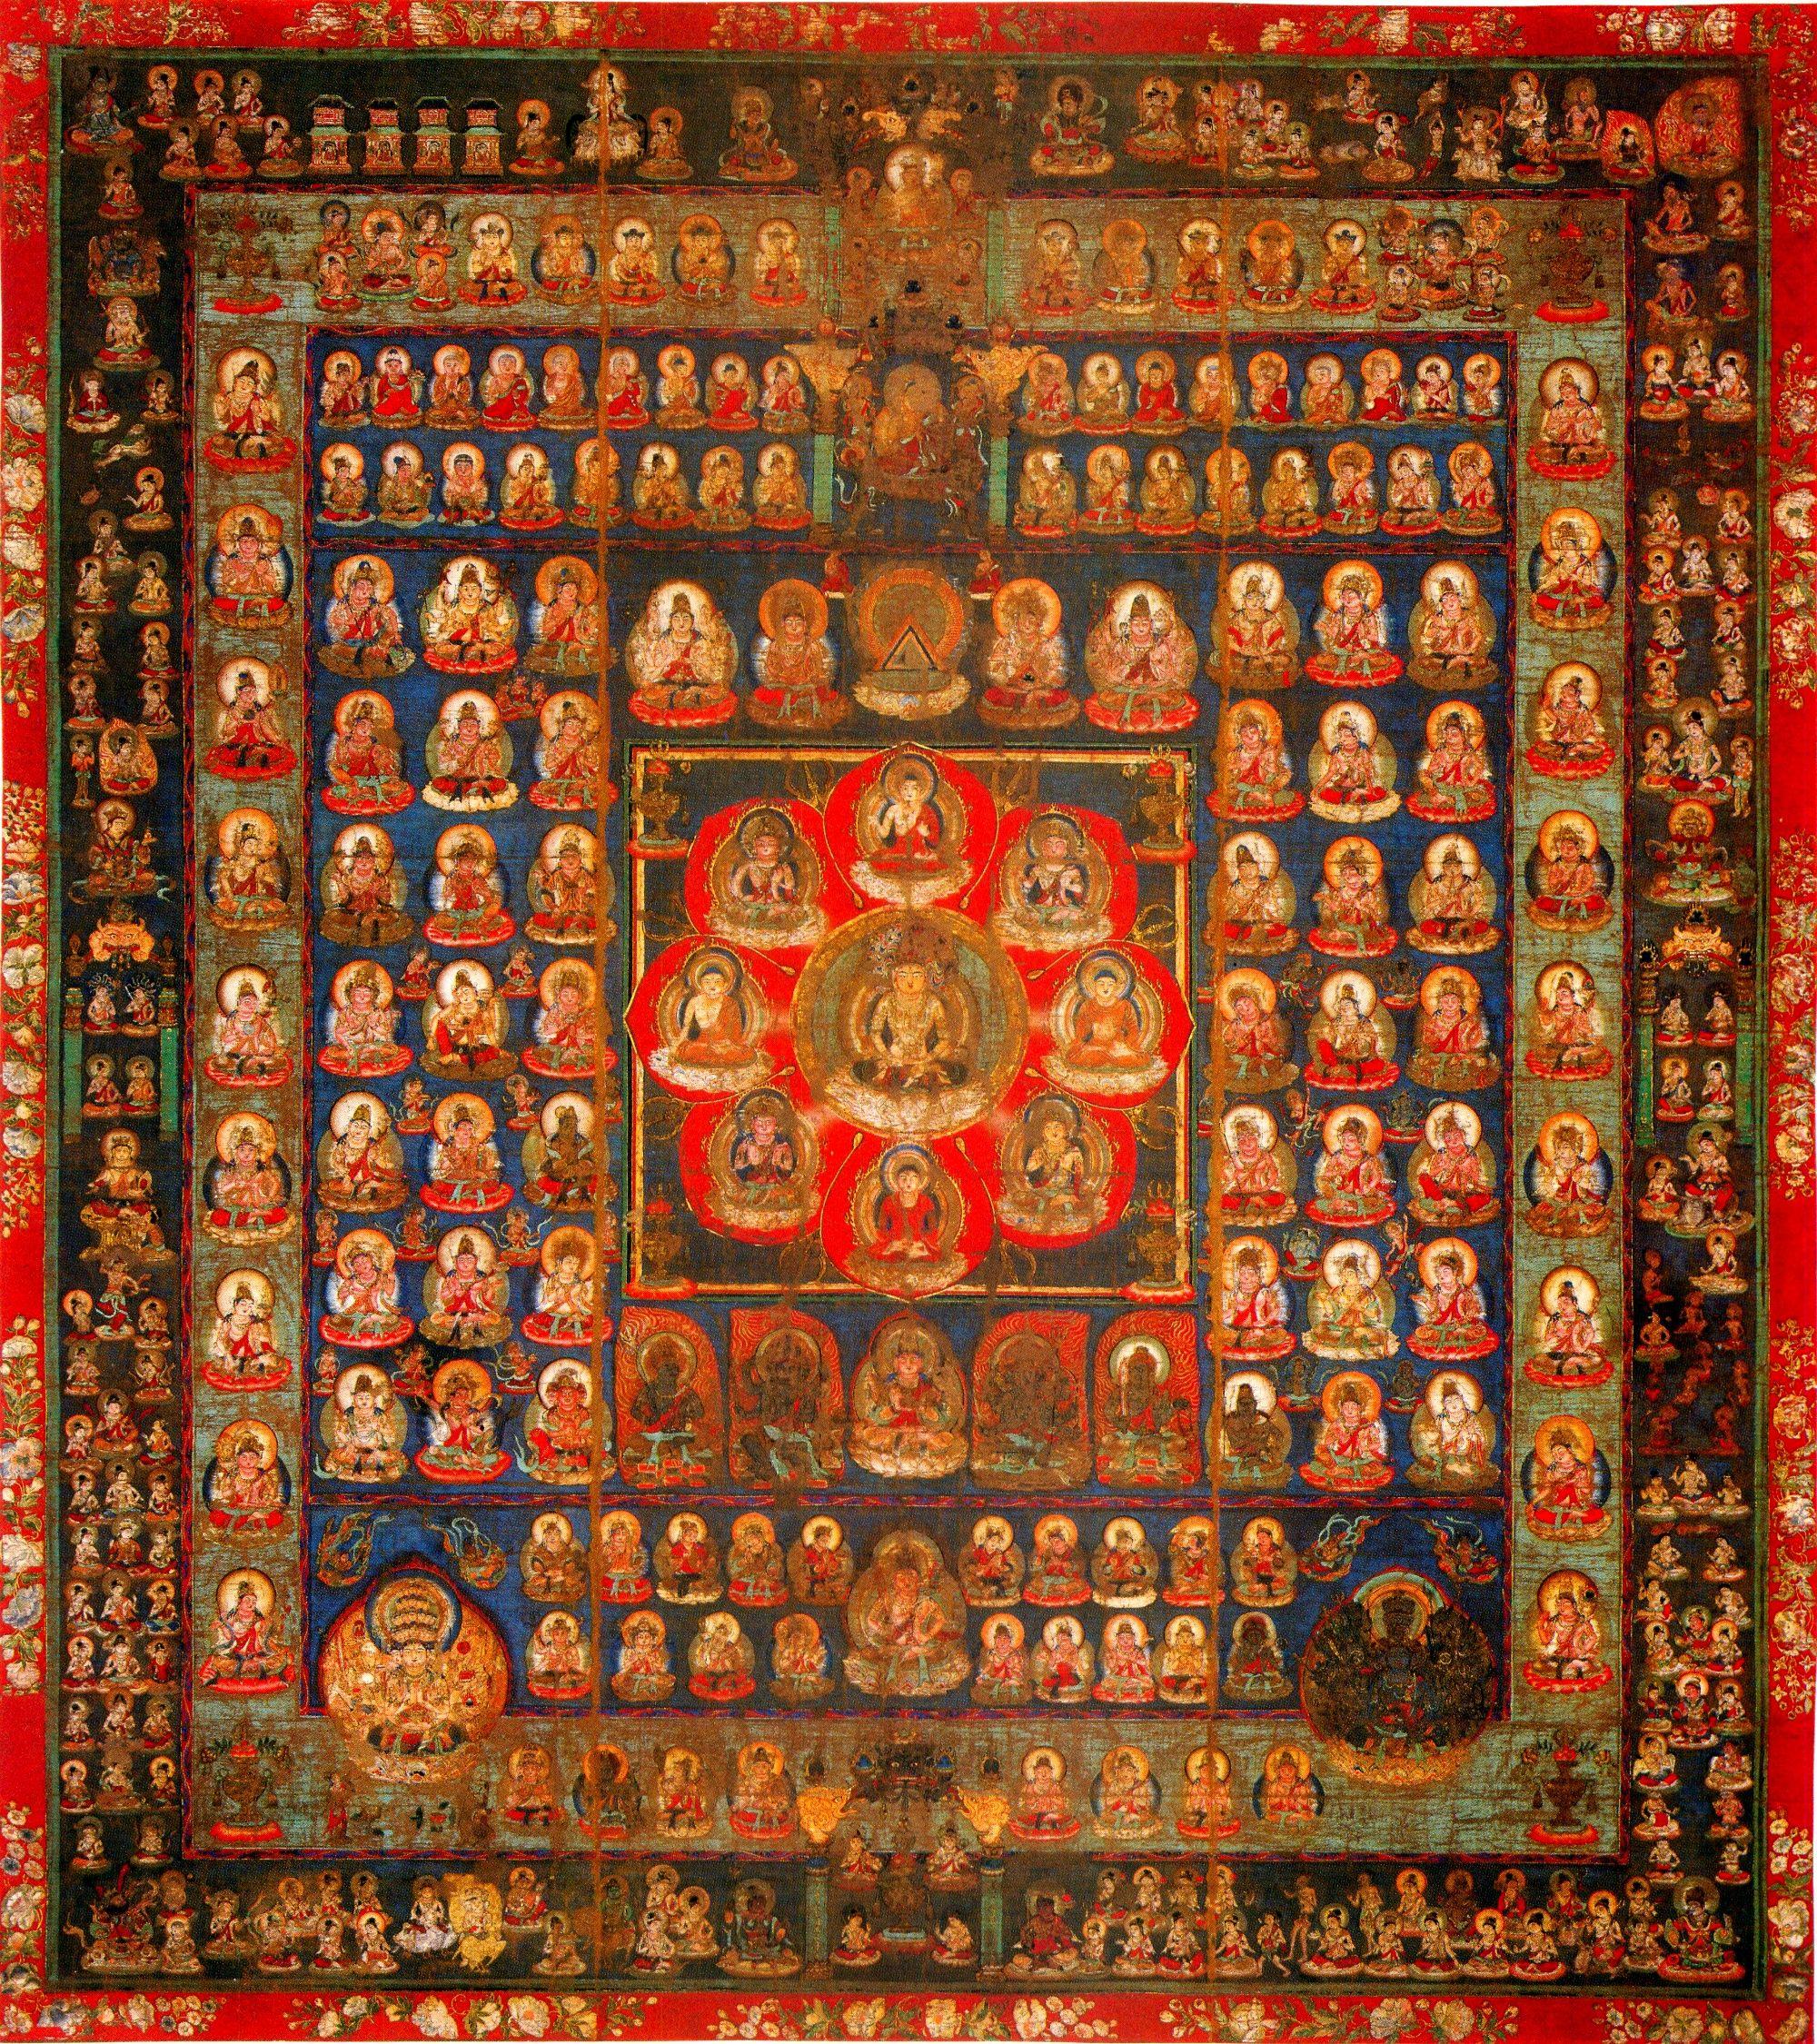 1000  images about Shingon 真言宗 on Pinterest | Buddhism ...